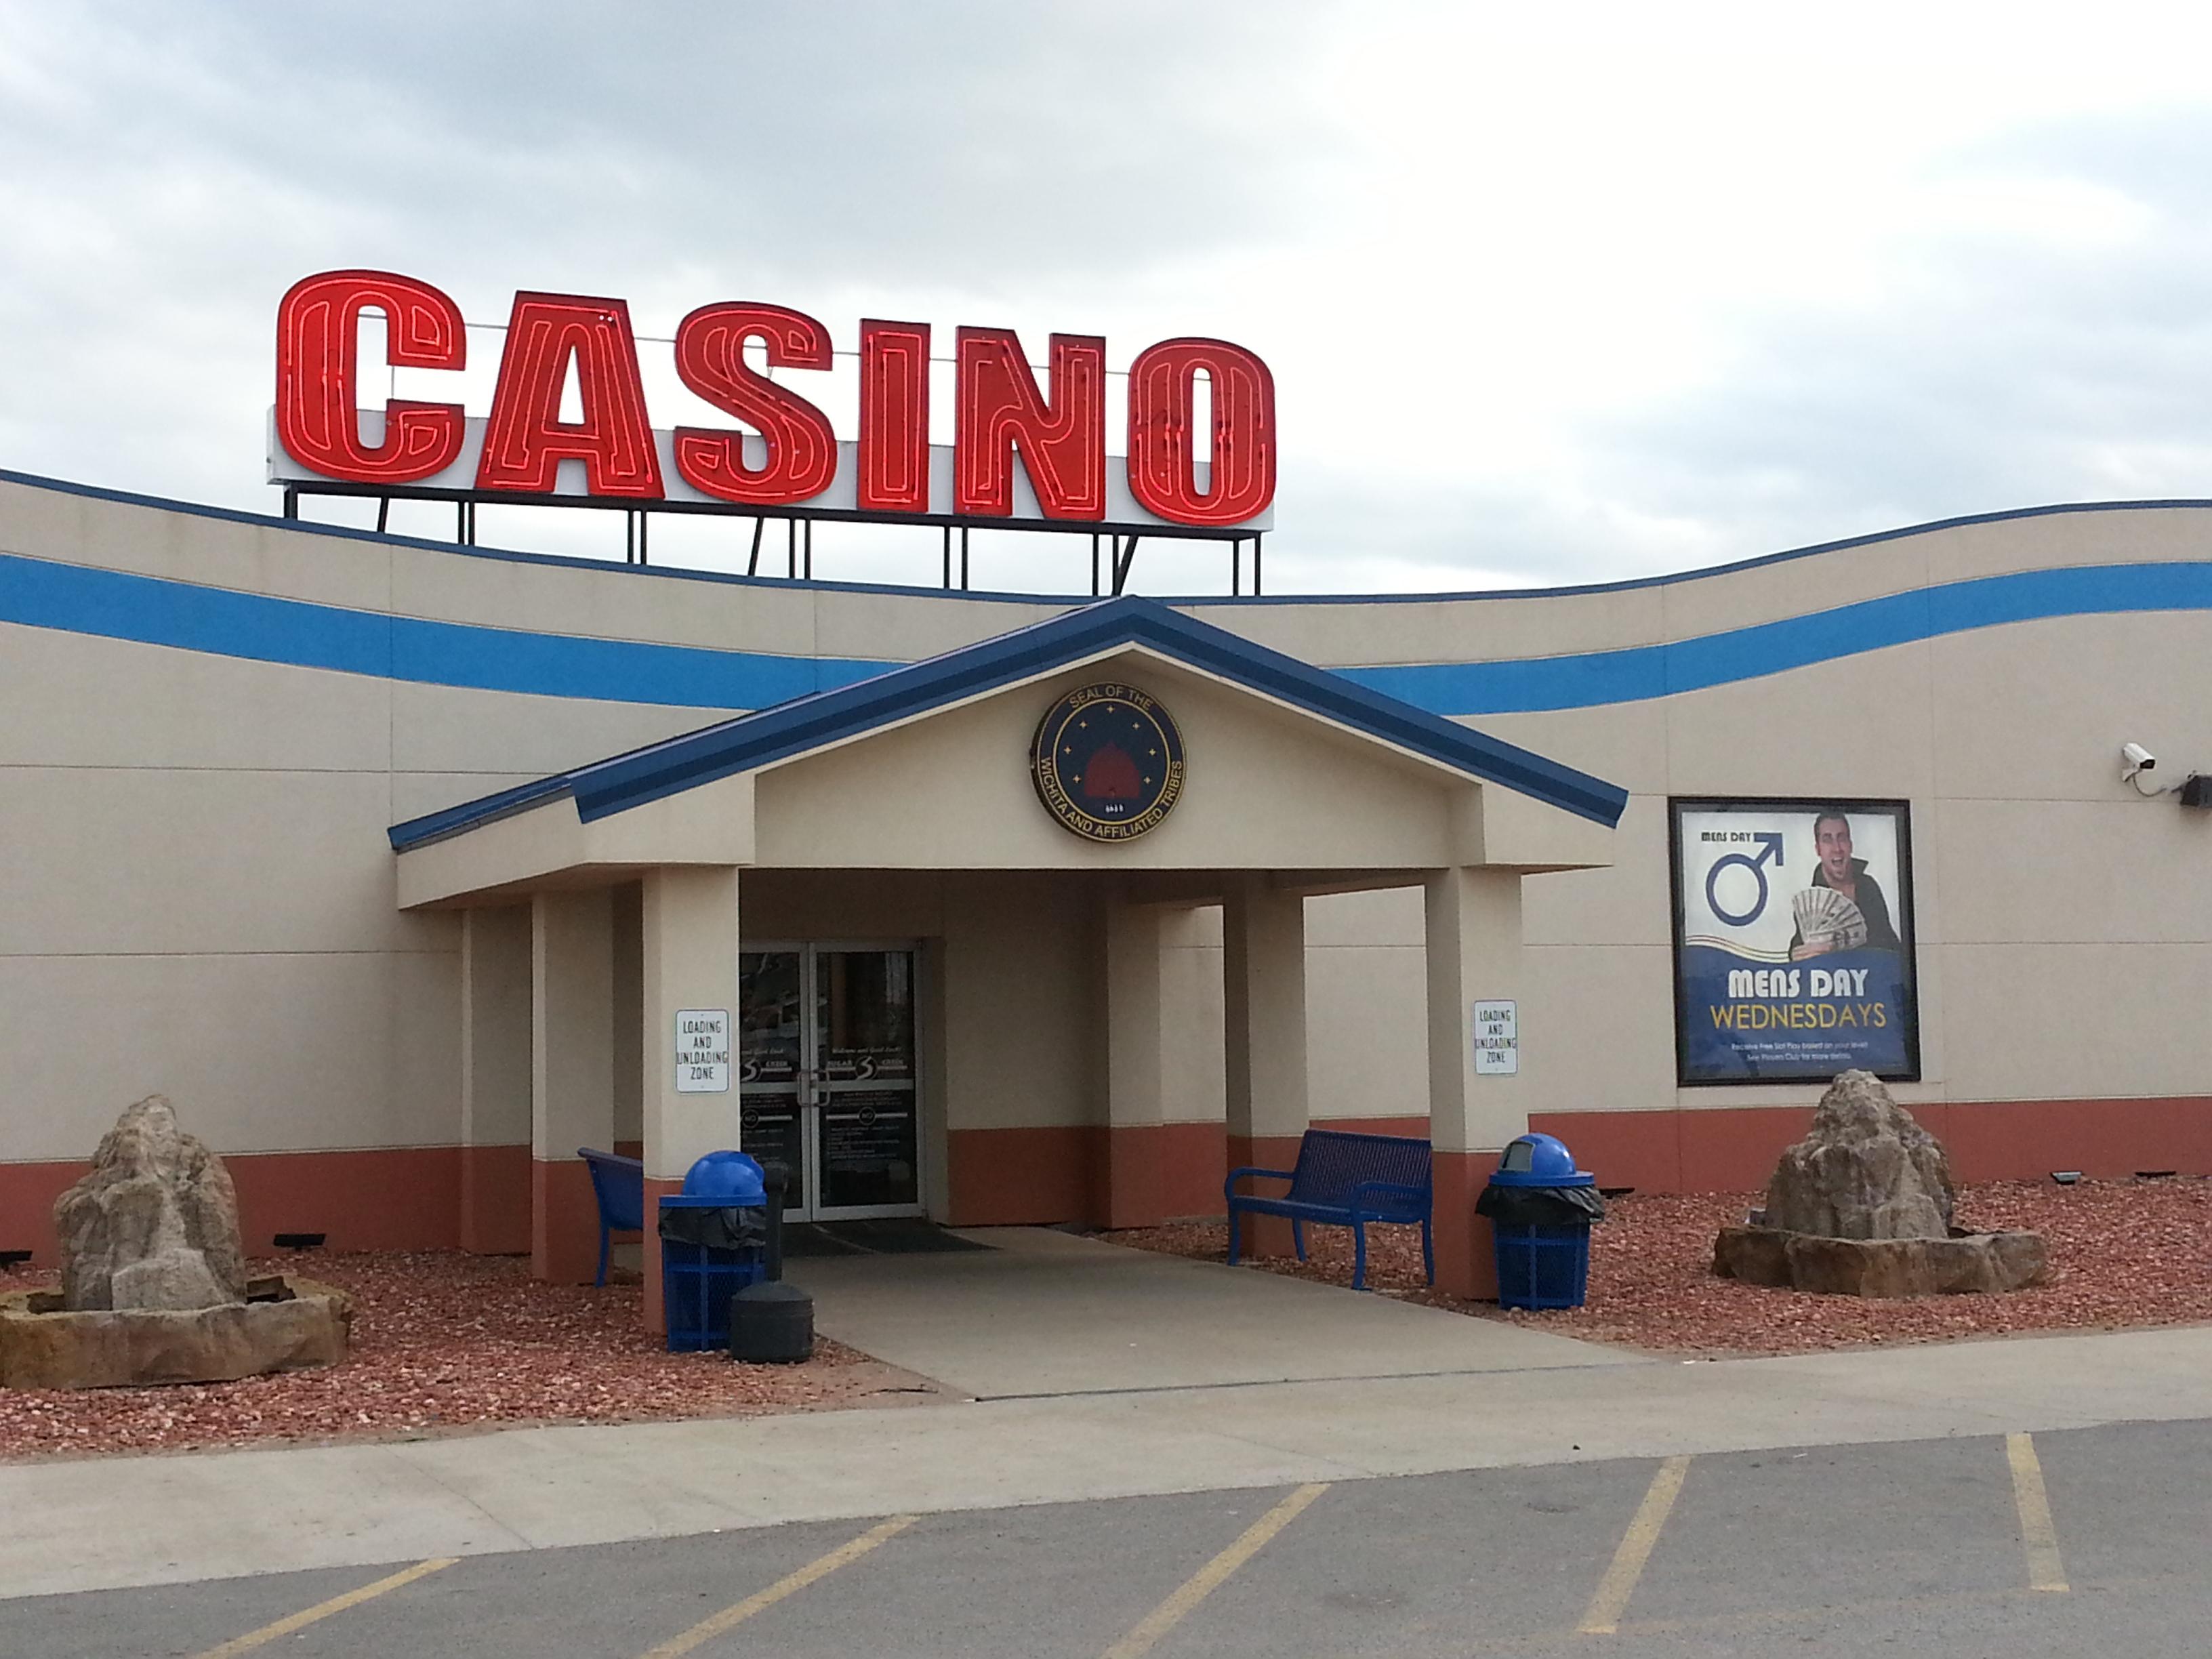 Sugar creek casino gaming age